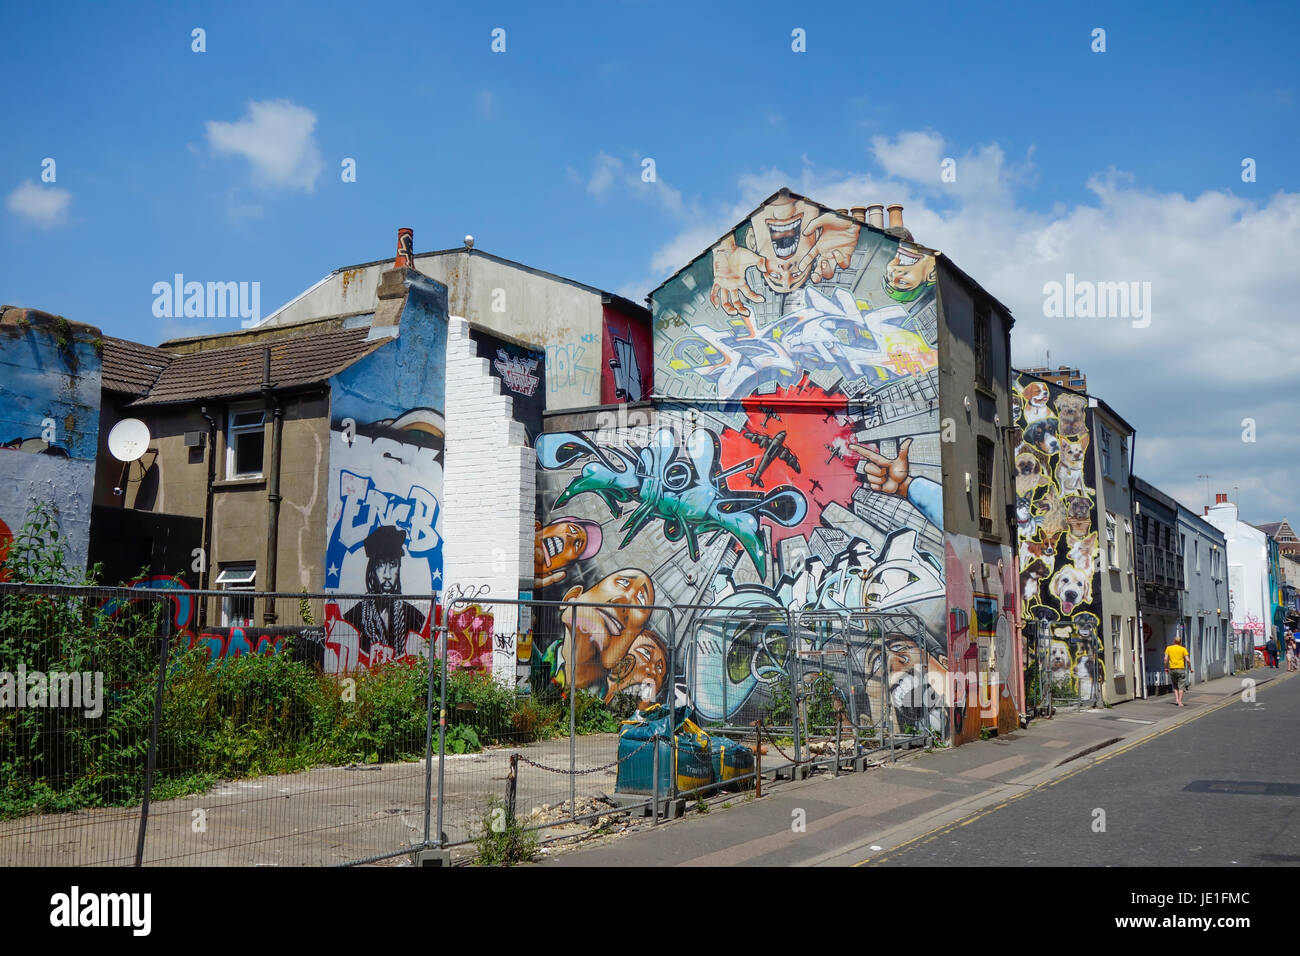 Graffiti Street Art in Brighton - Stock Image